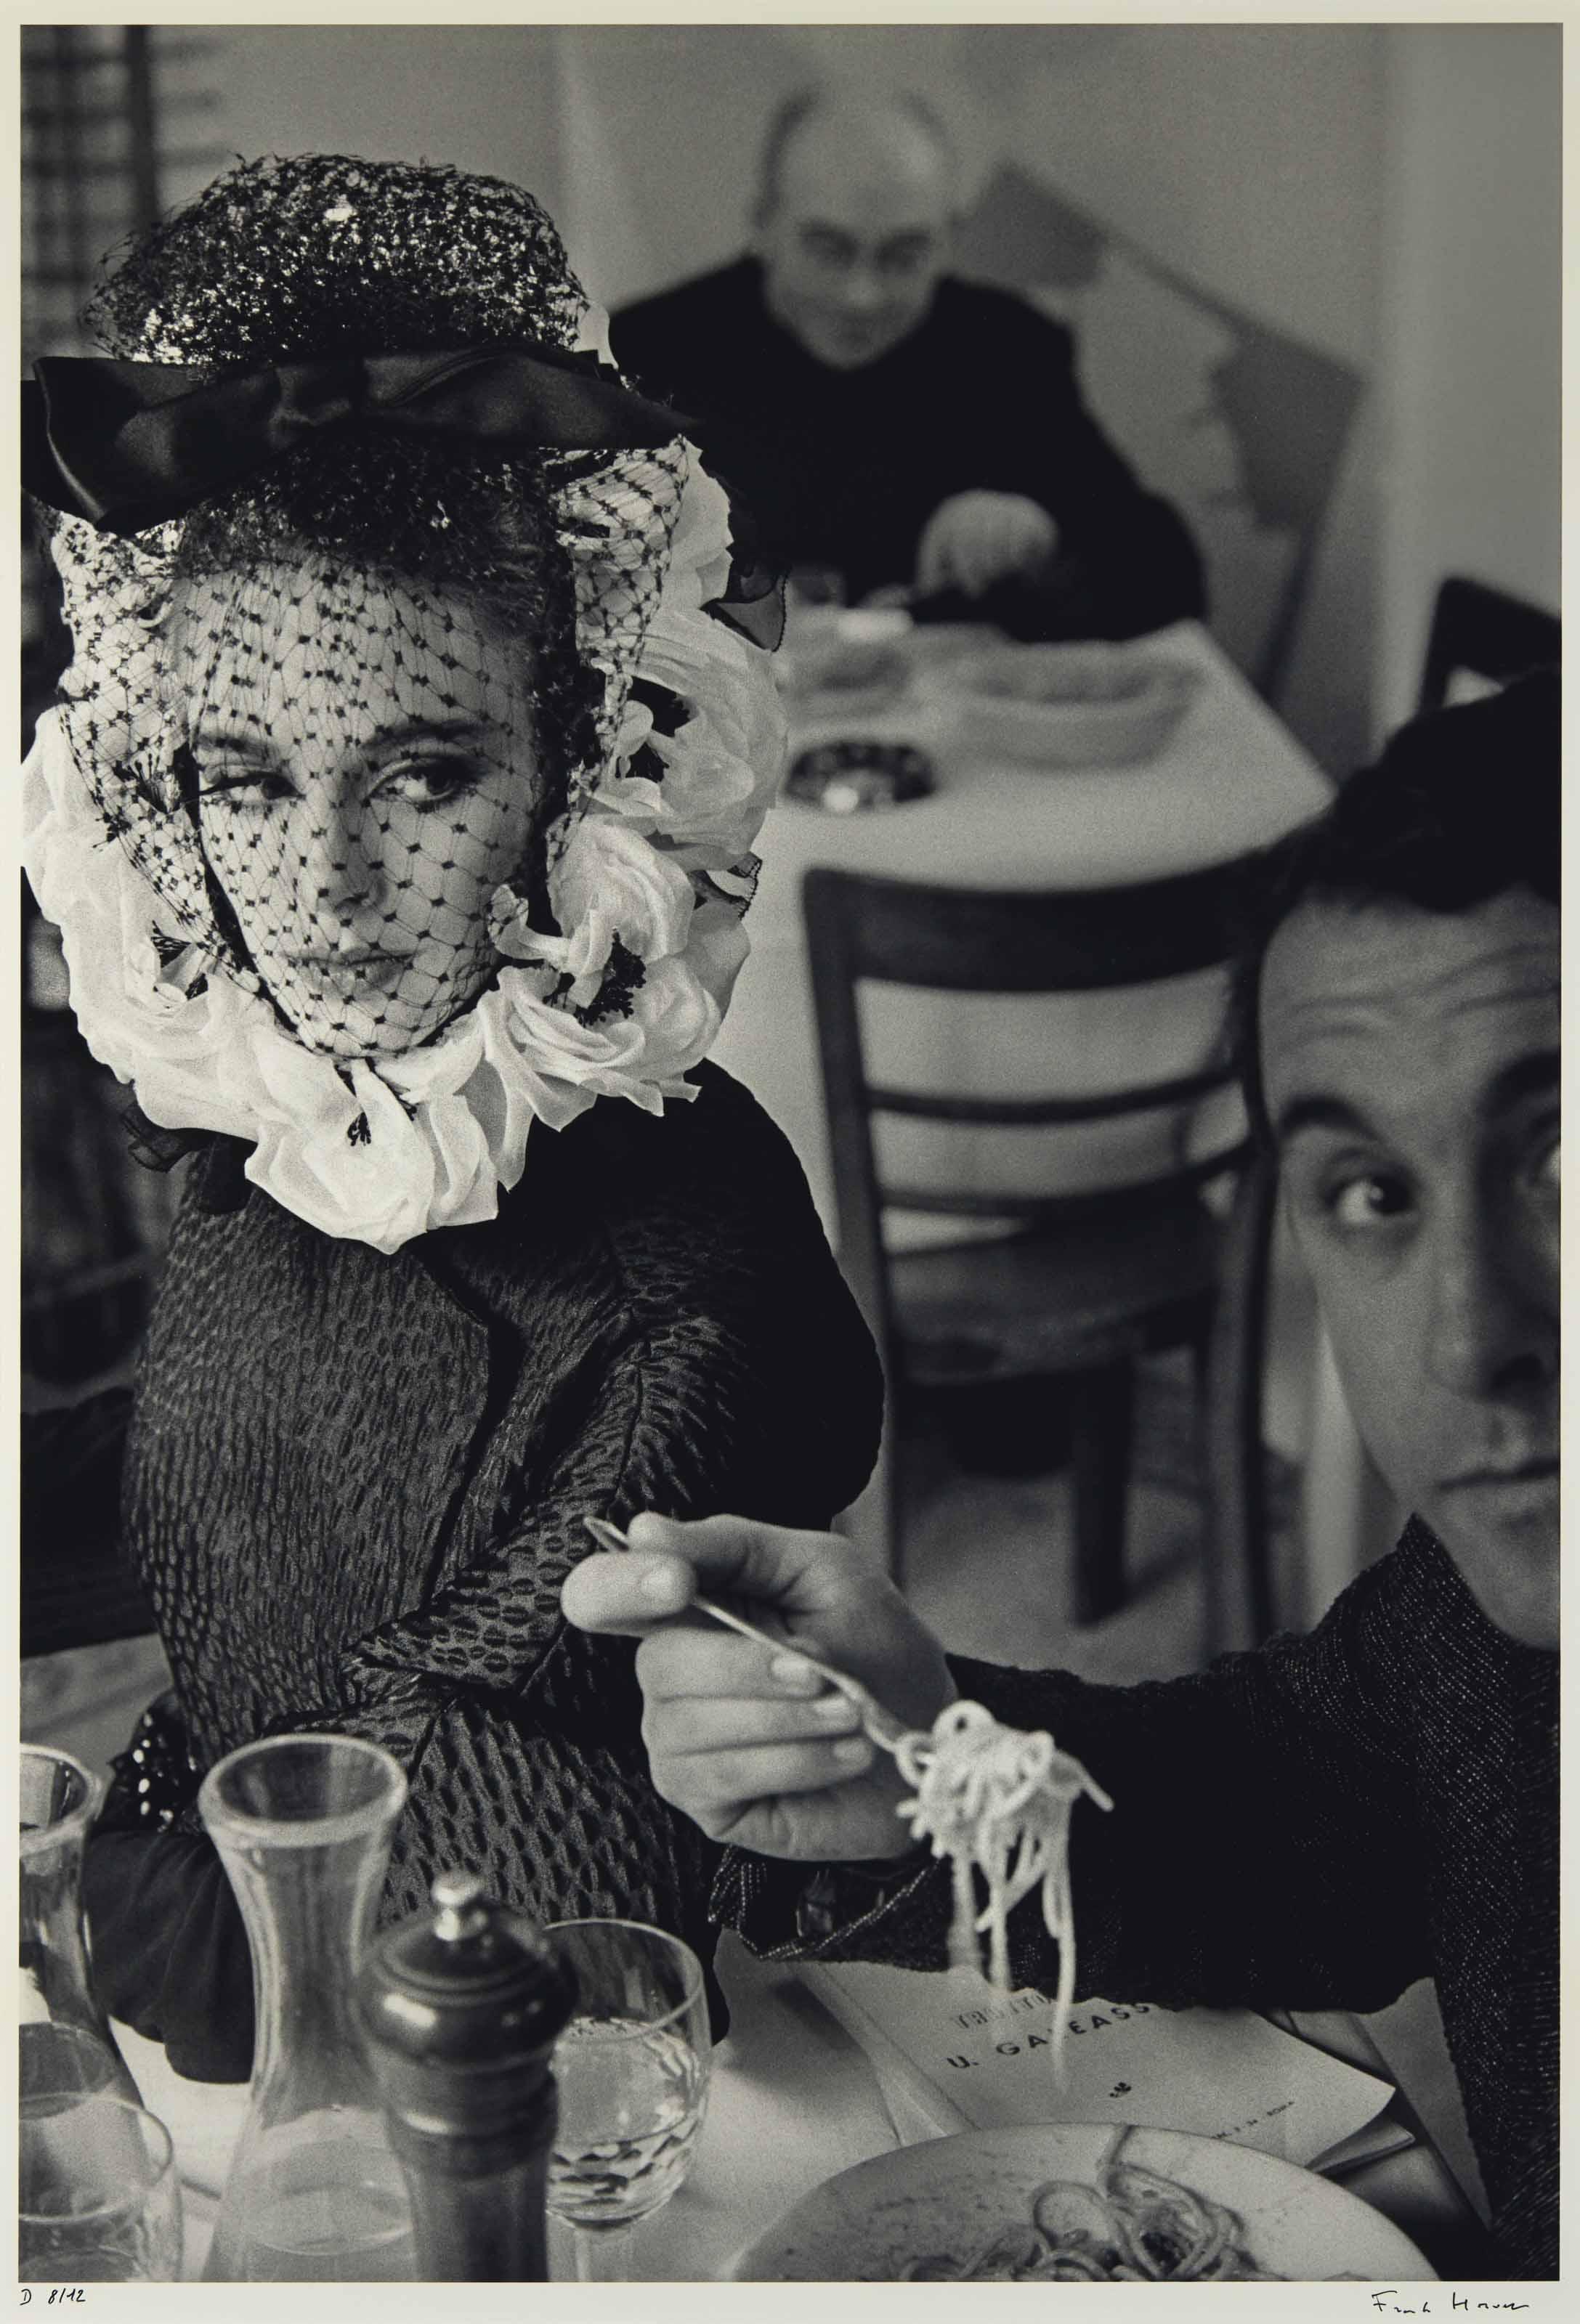 Rome, Italy, for Harper's Bazaar italian high fashion, Deborah Dixon eating spaghetti with writer Antero Piletti (a), 1962